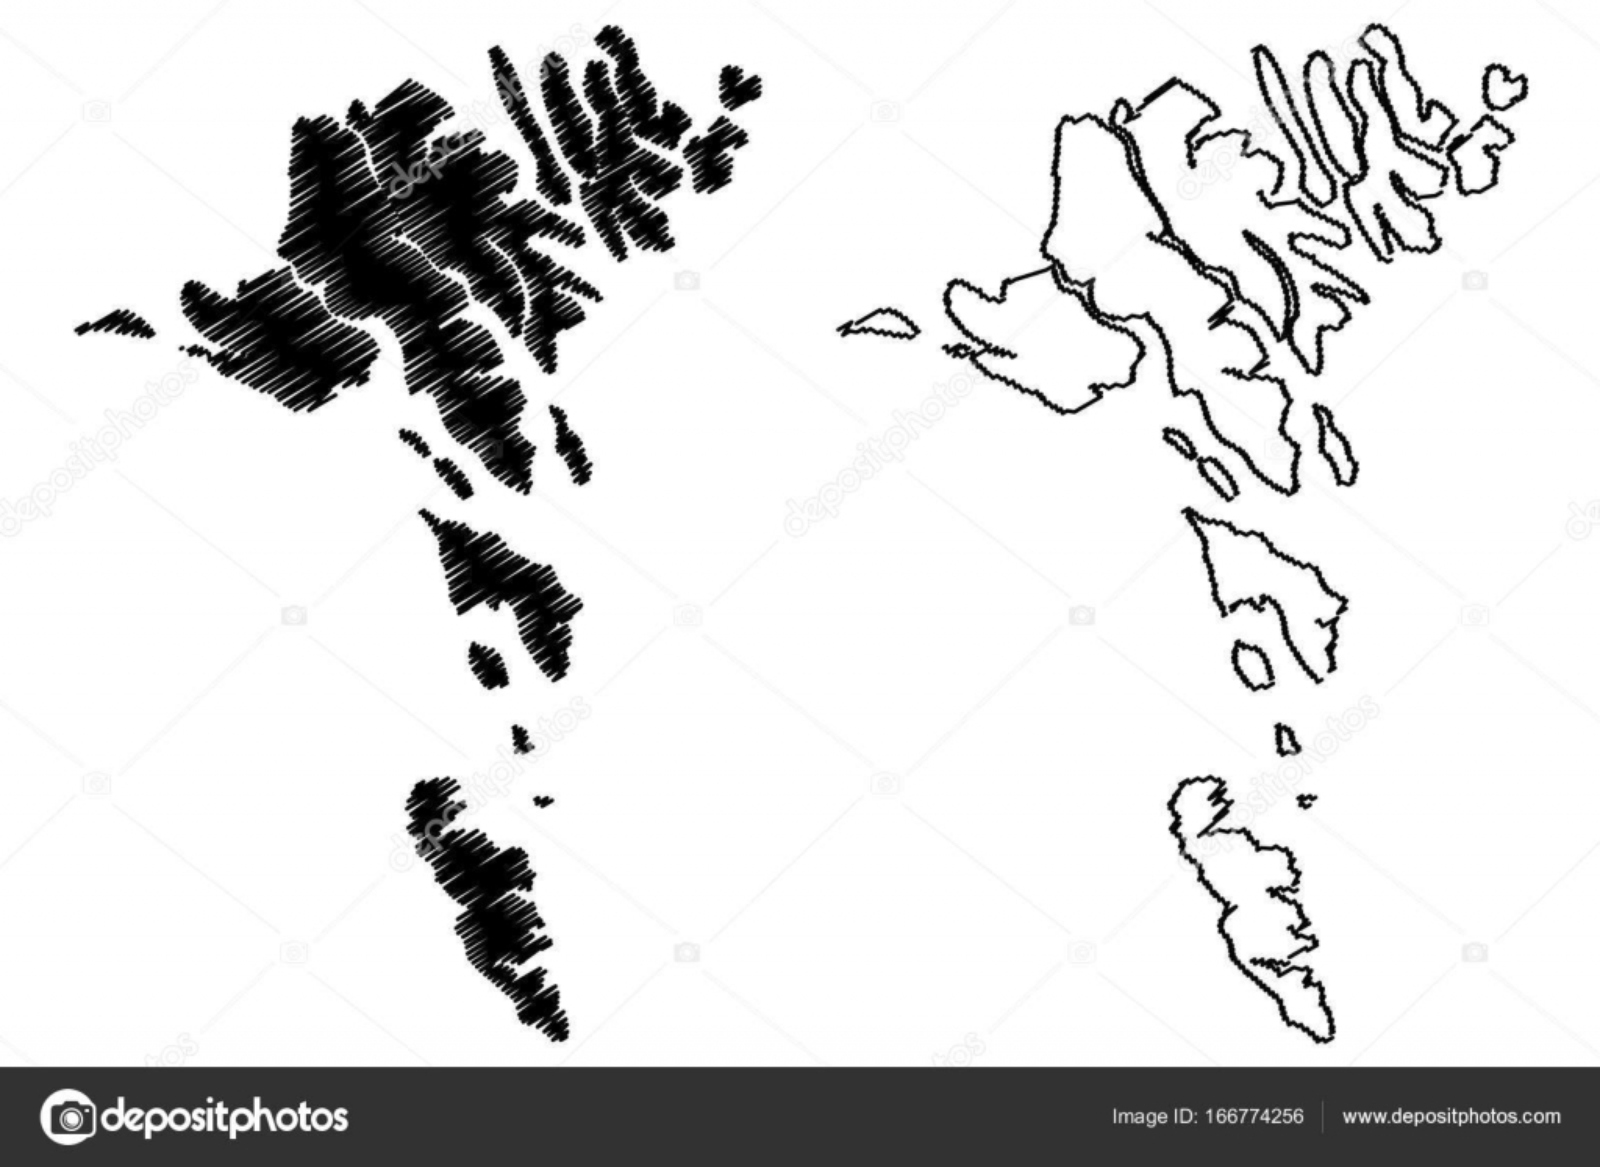 Färöer Inseln Karte.Färöer Inseln Karte Vektor Stockvektor Danler 166774256